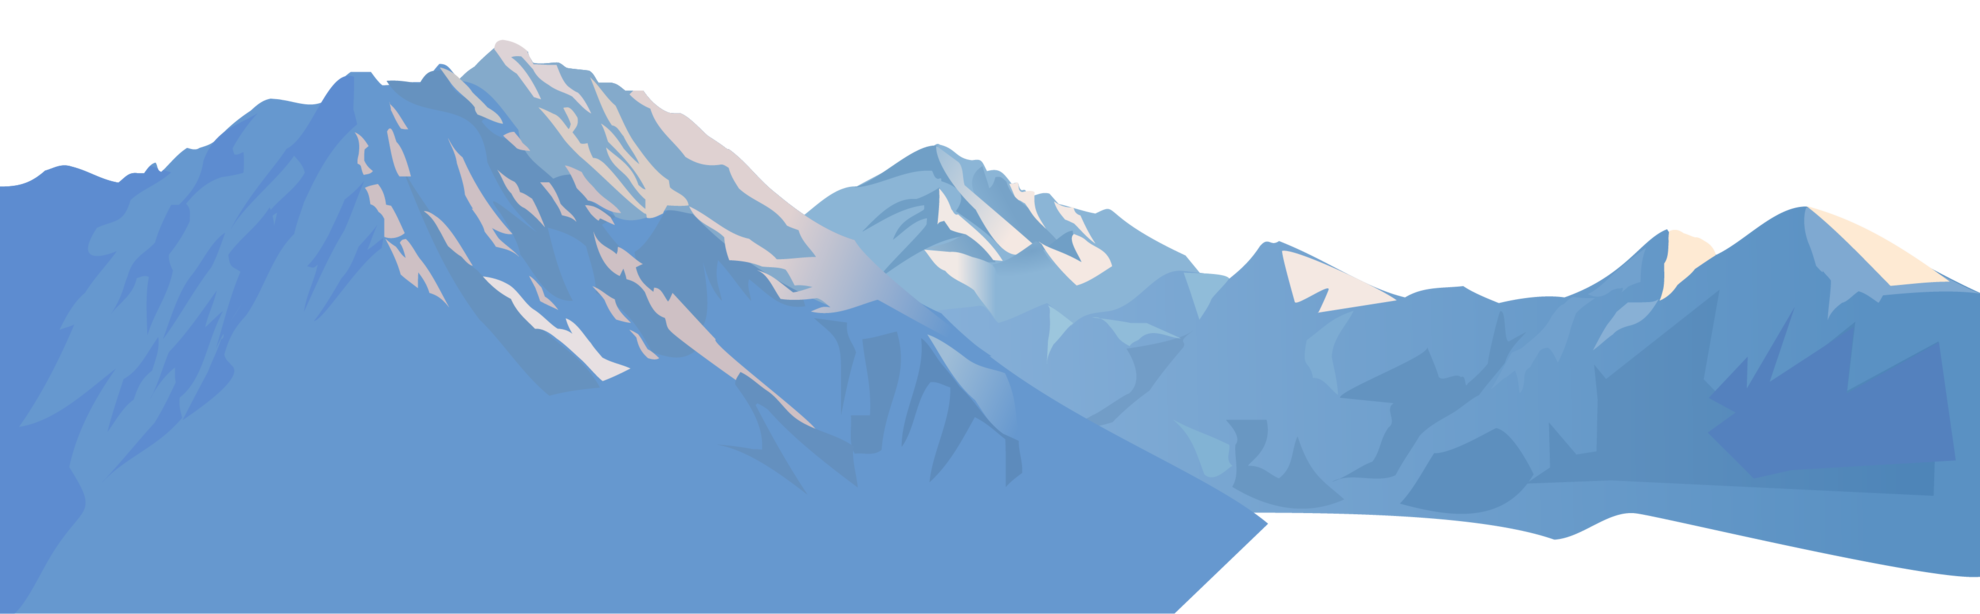 Hackdavis january code for. Hills clipart glacier